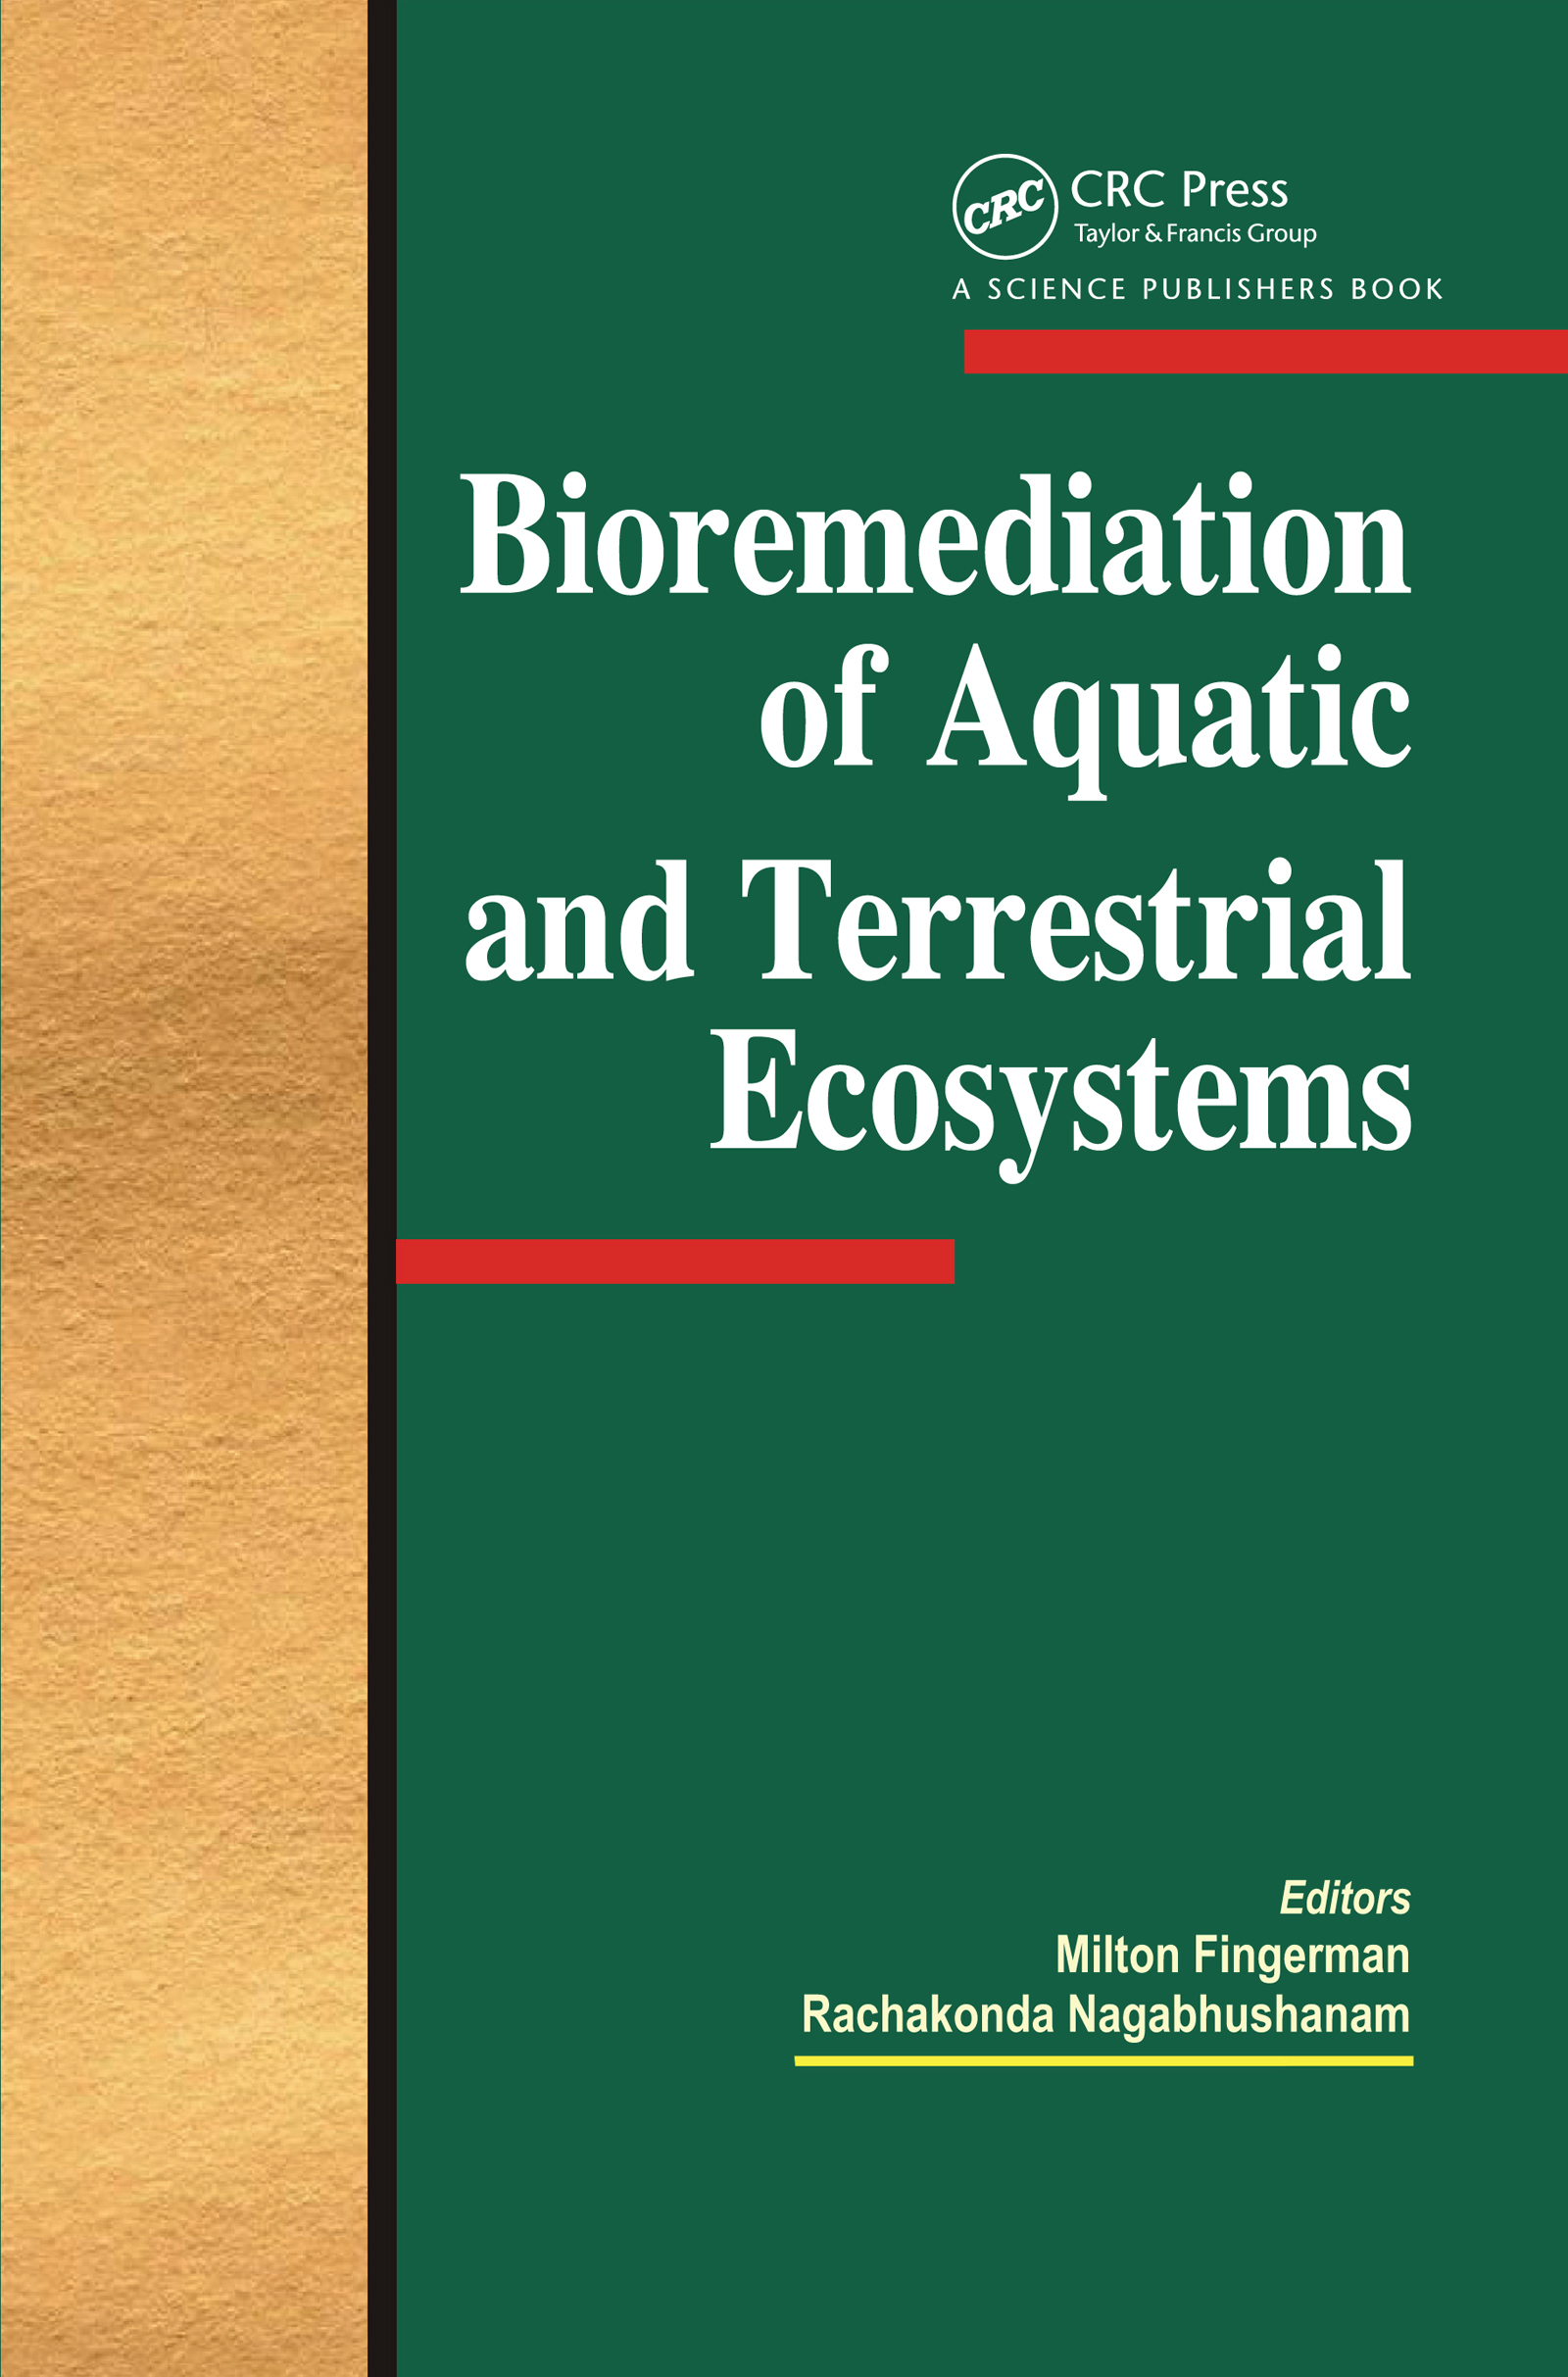 Bioremediation of Aquatic and Terrestrial Ecosystems